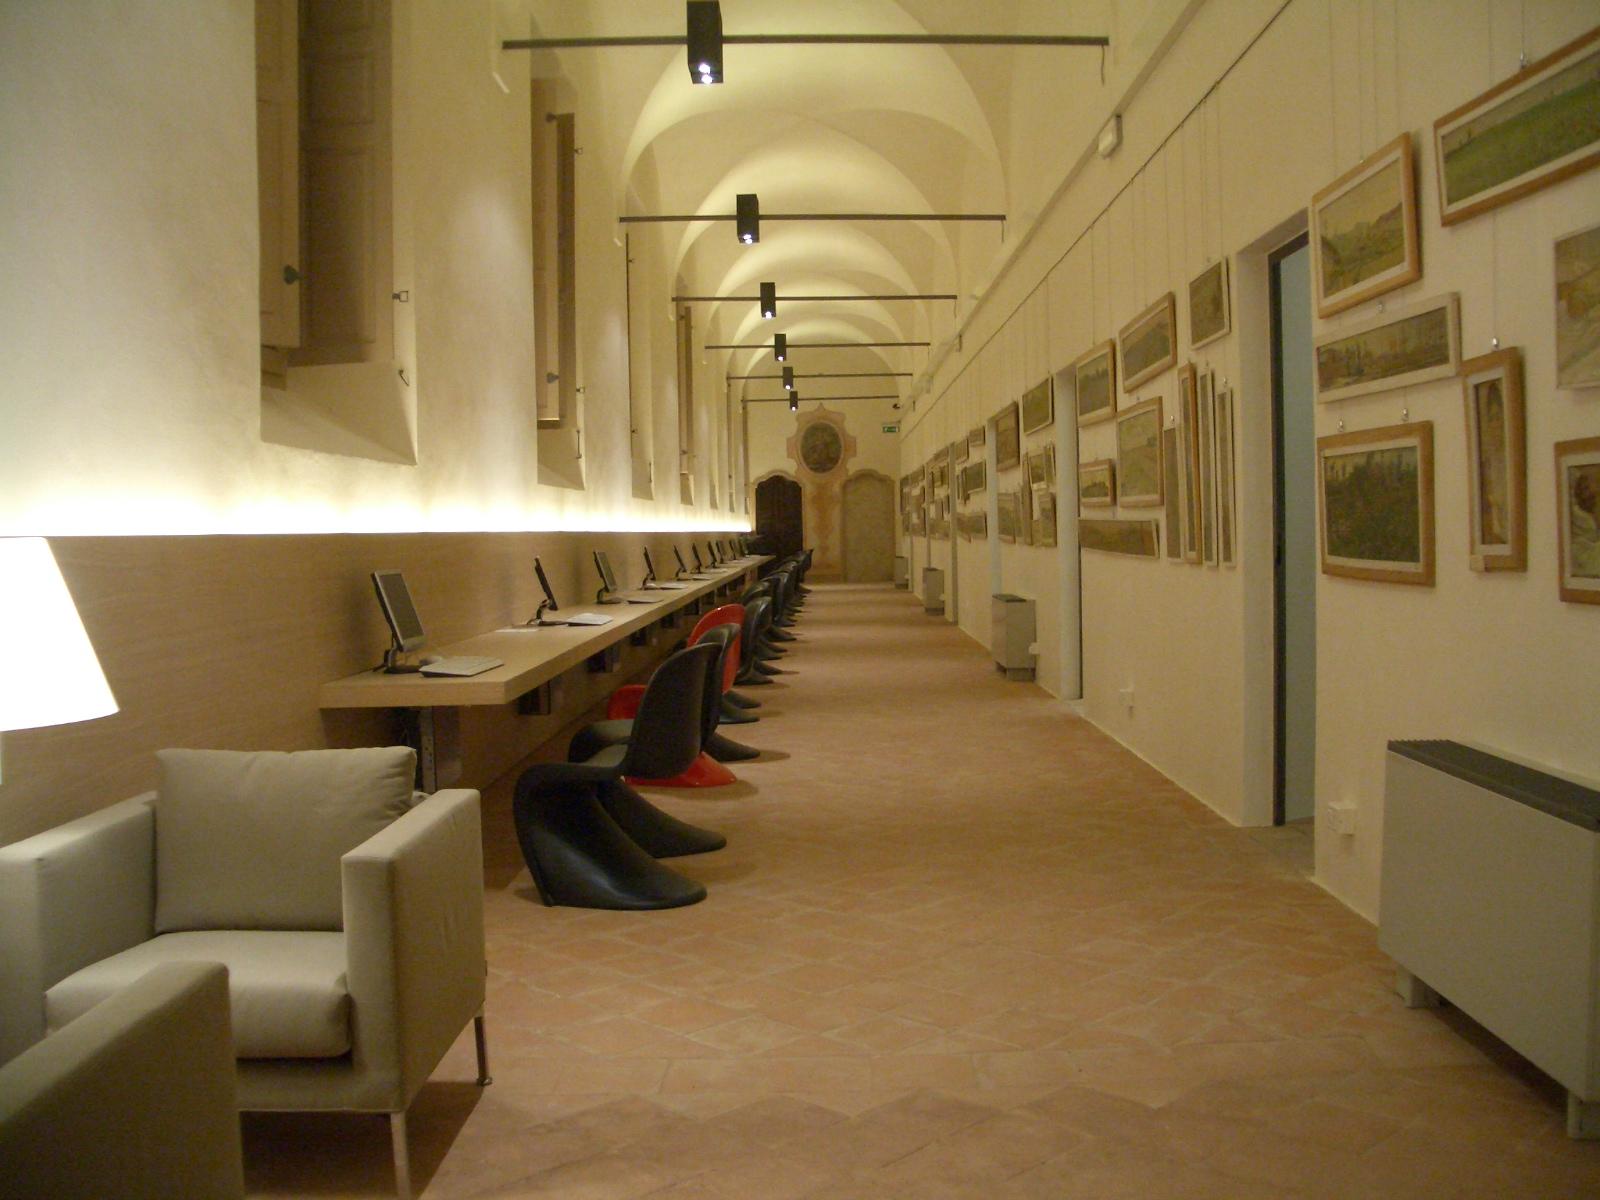 interno nbiblioteca